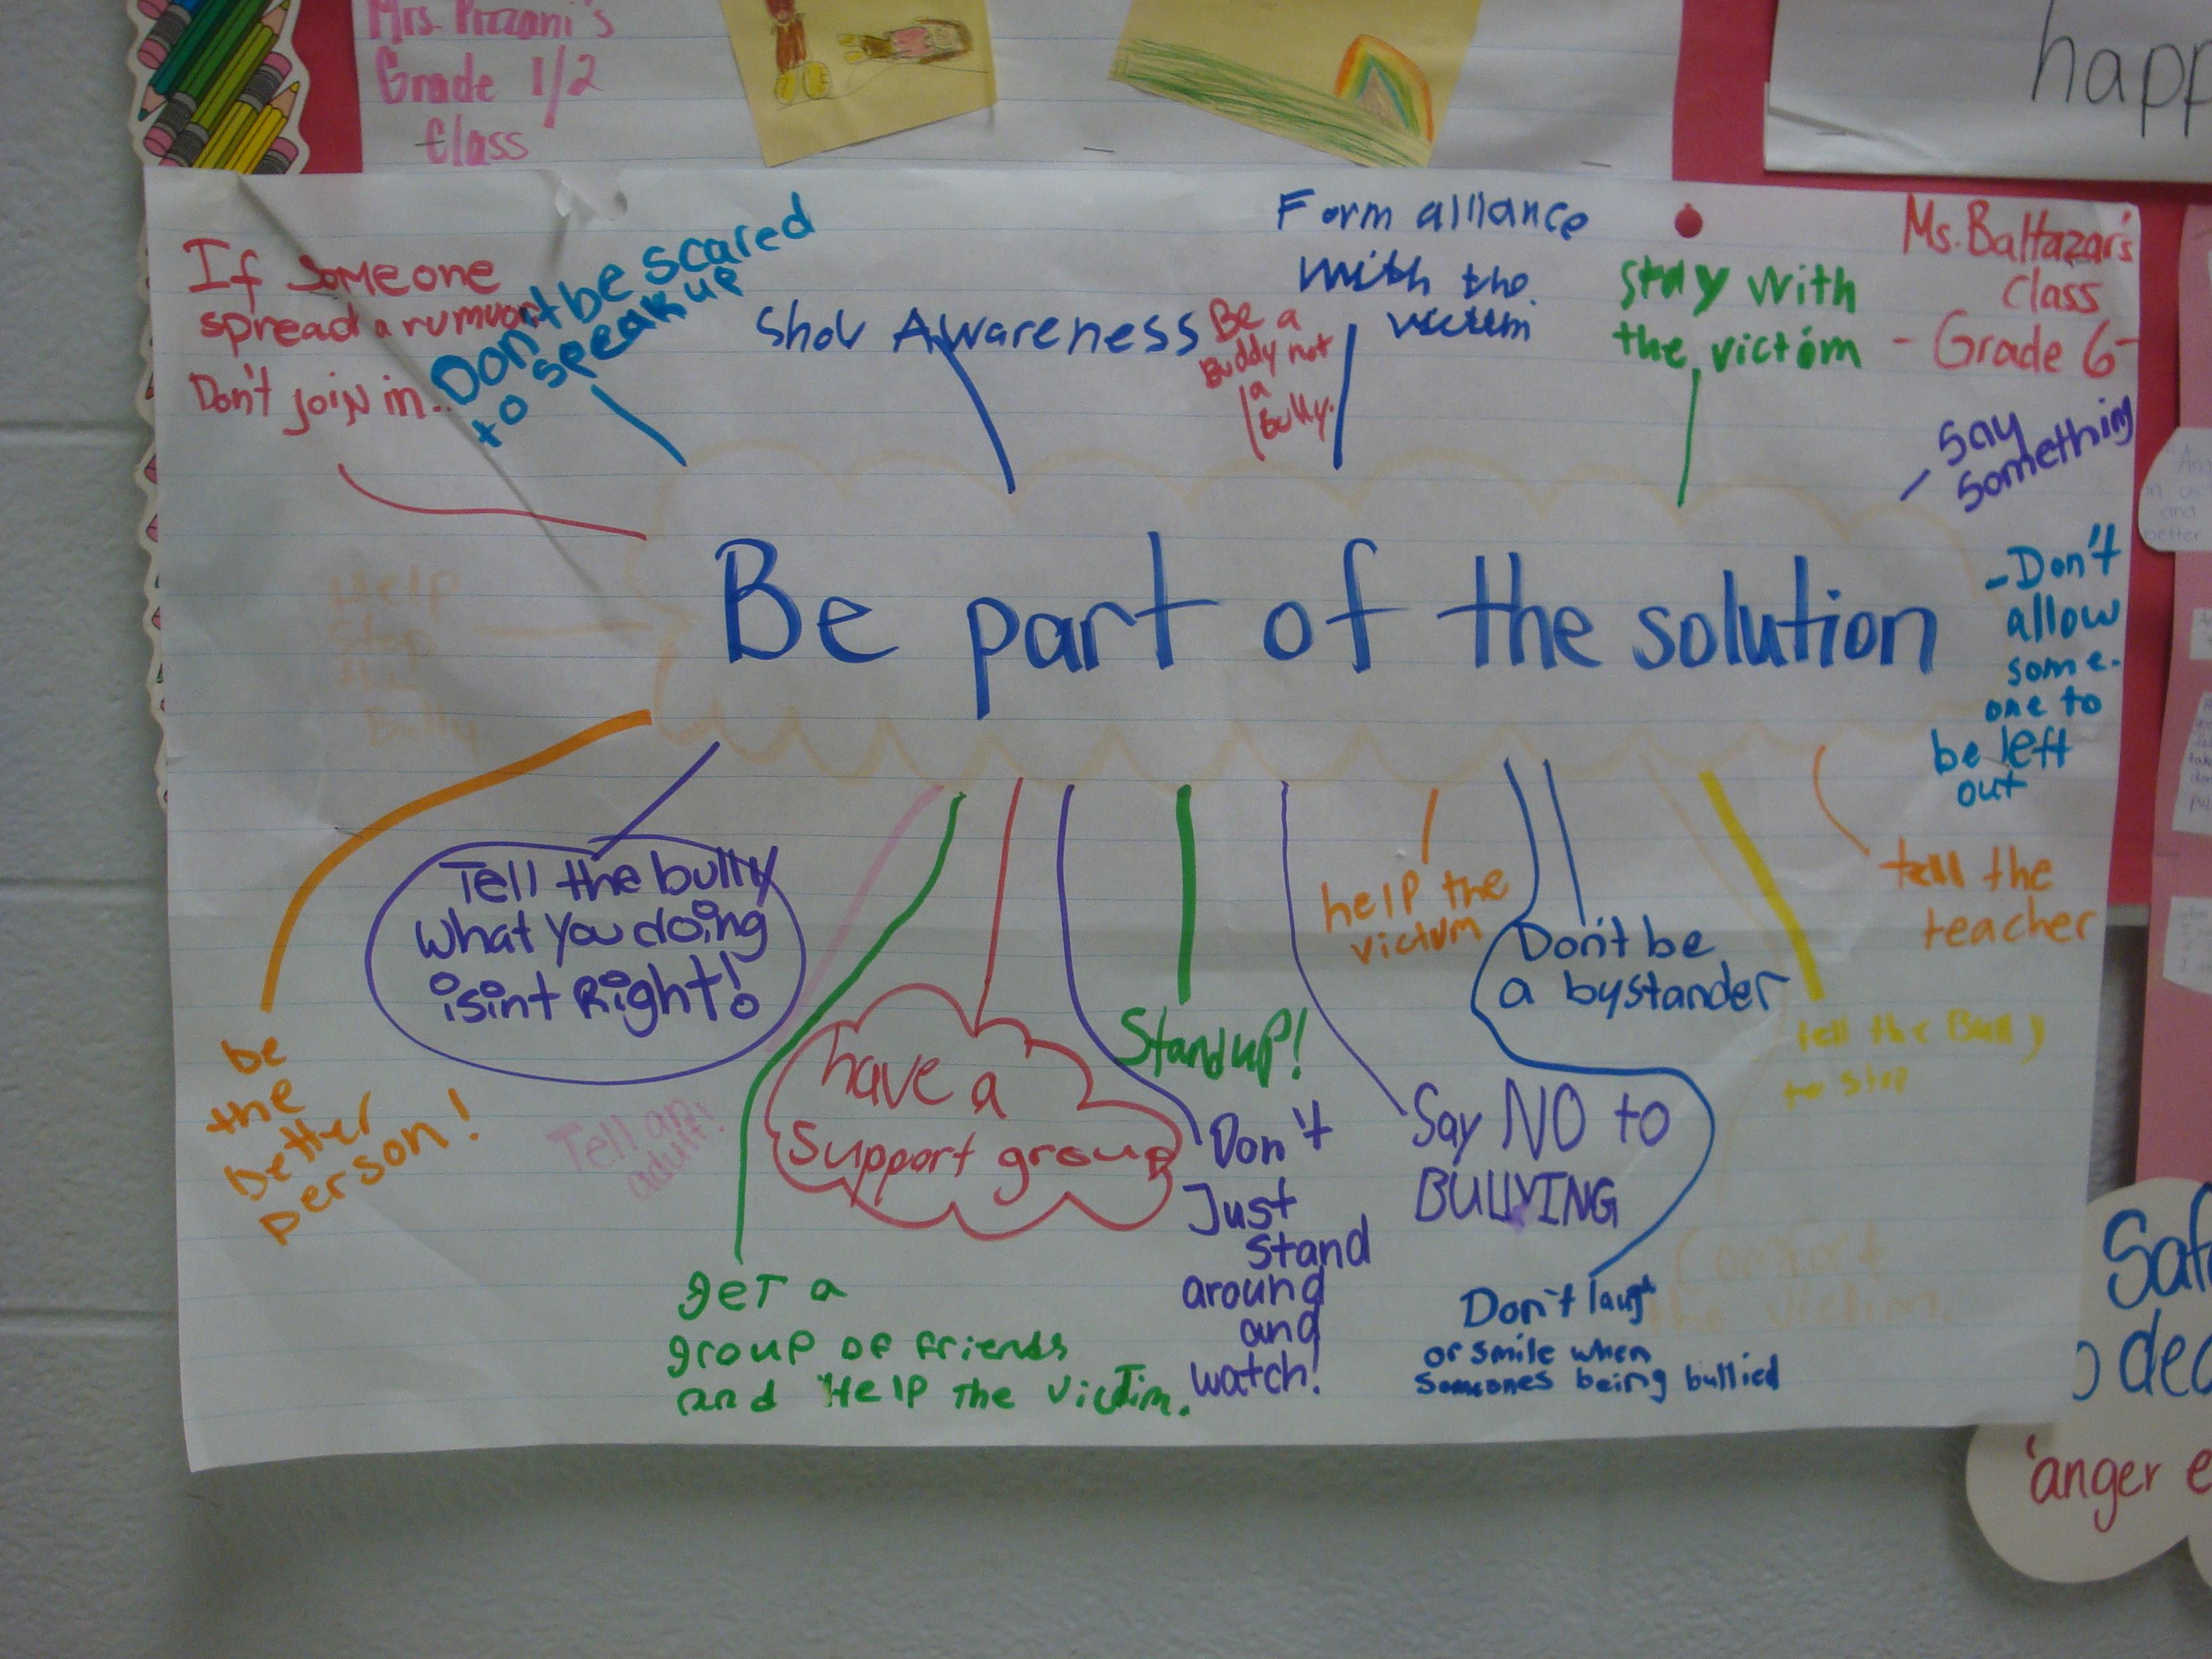 Bullying In Elementary School 3 Key Ways To Stop It